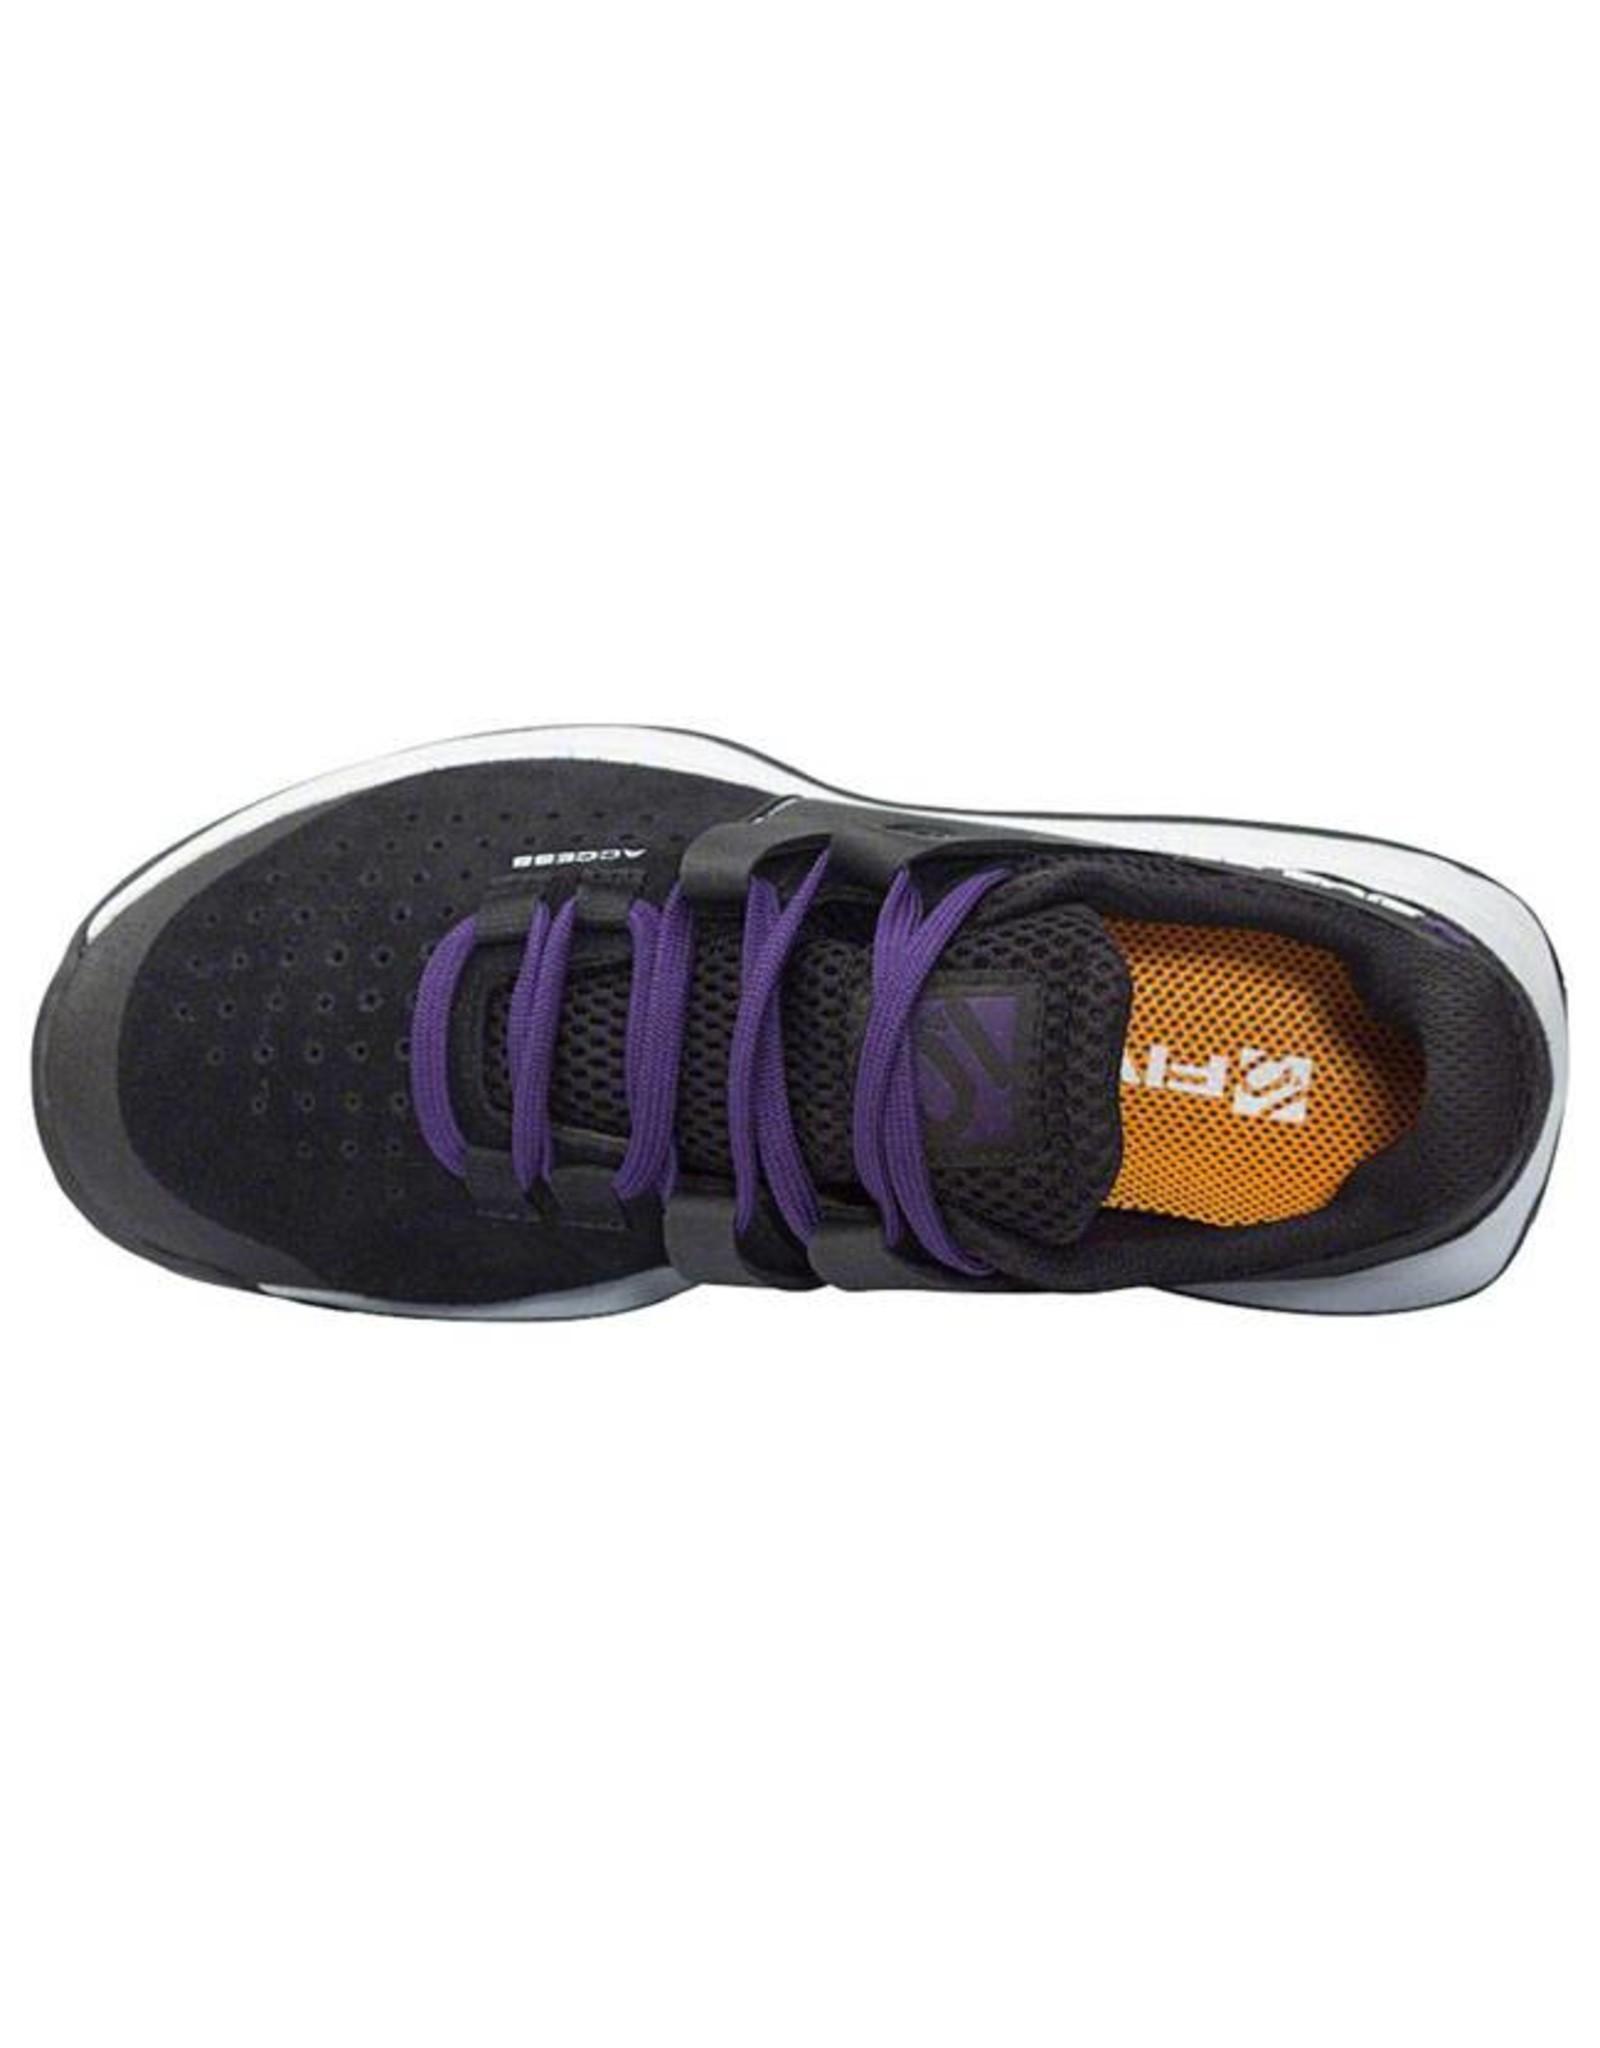 Five Ten Five Ten Access Women's Approach Shoe: Gray 10